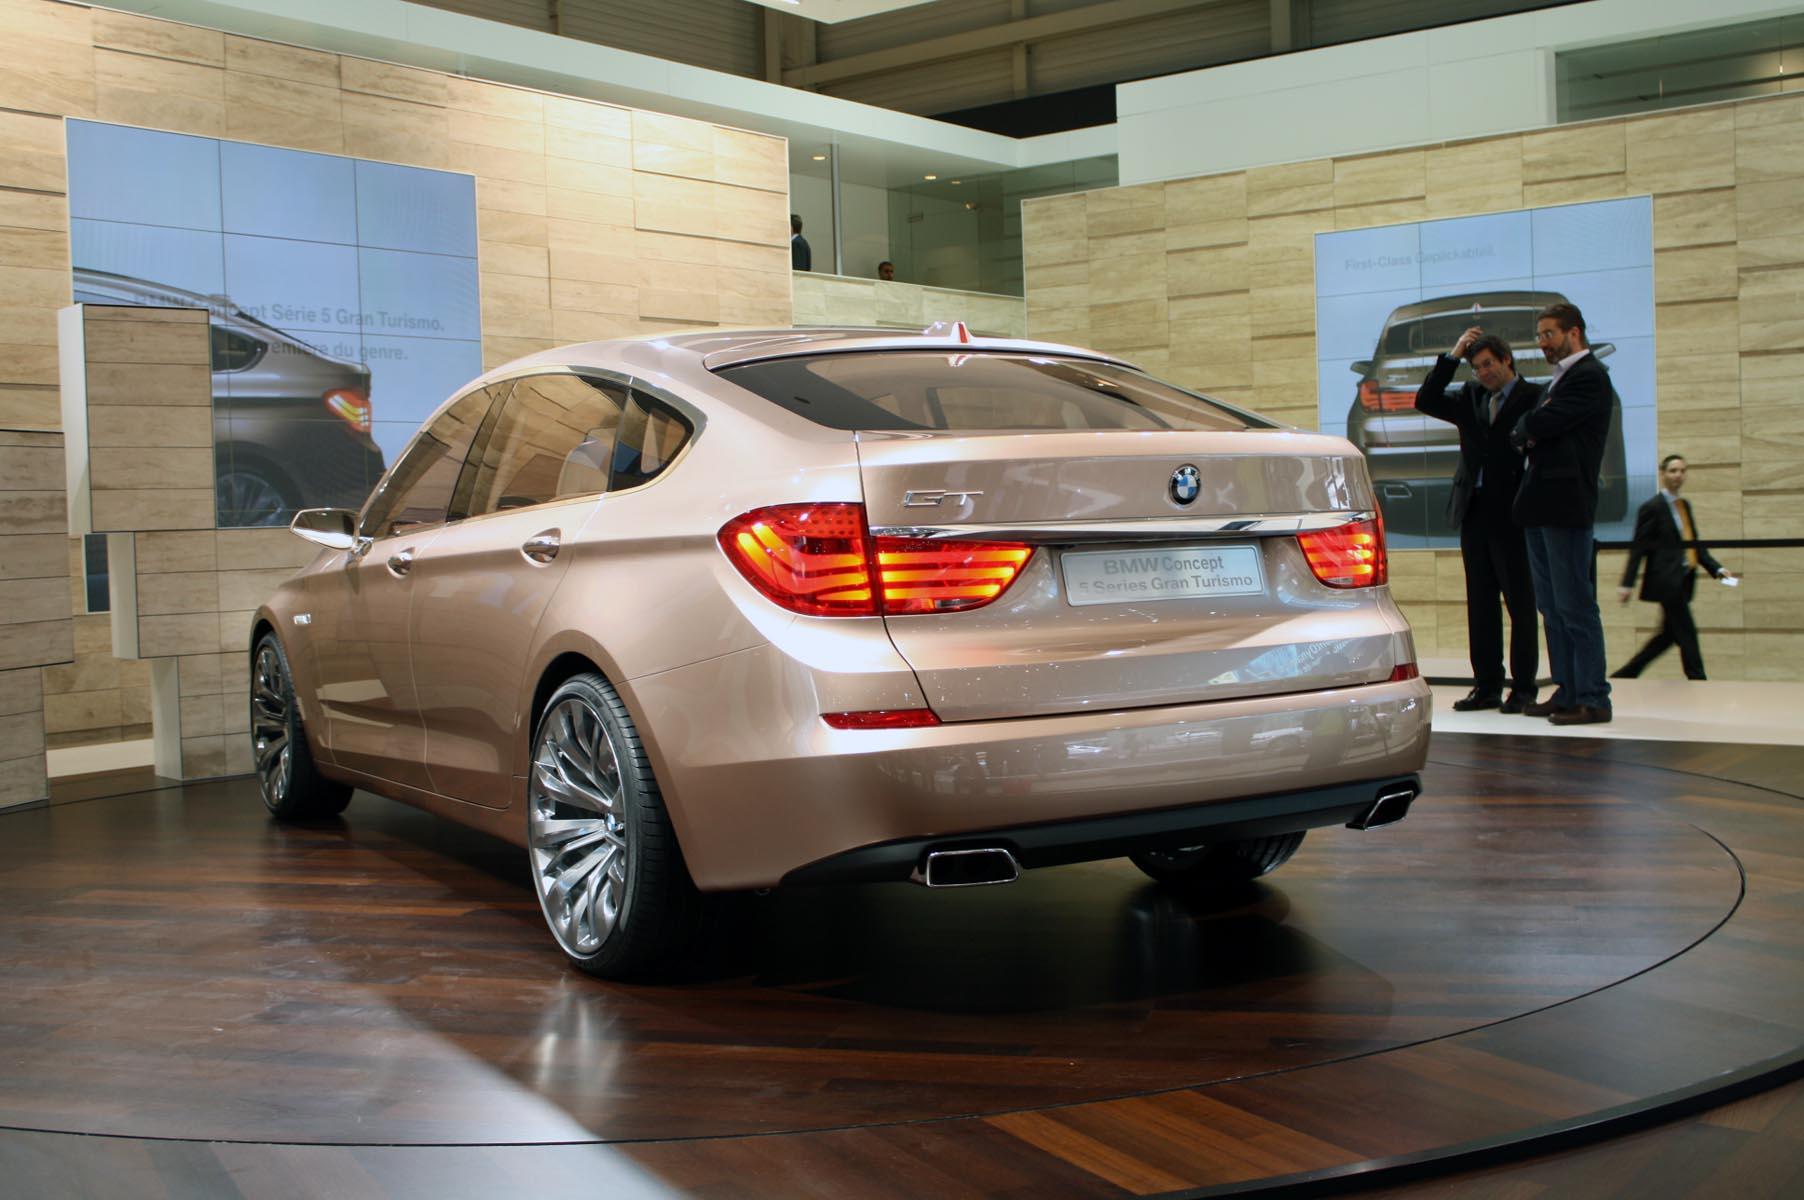 2009 BMW Z9 Gran Turismo Concept - Car Pictures